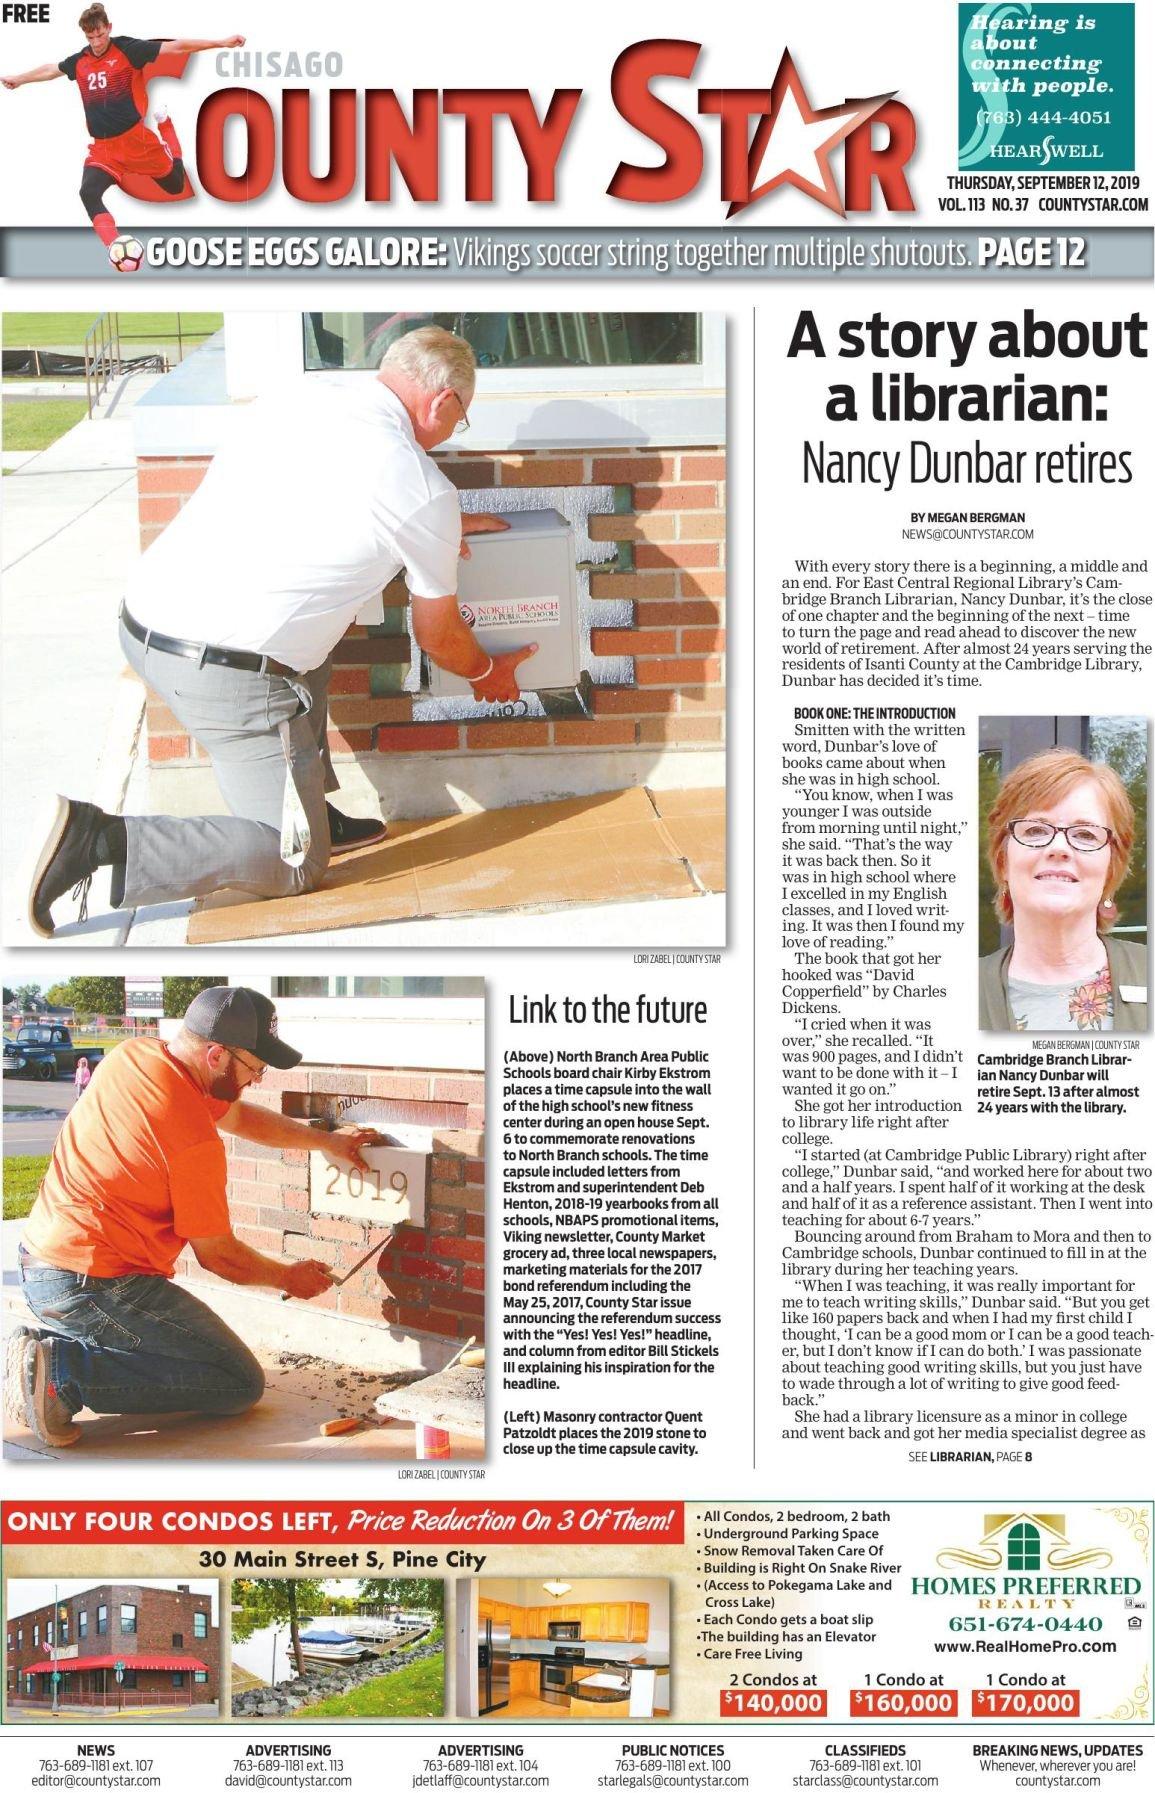 Chisago County Star e-edition September 12, 2019